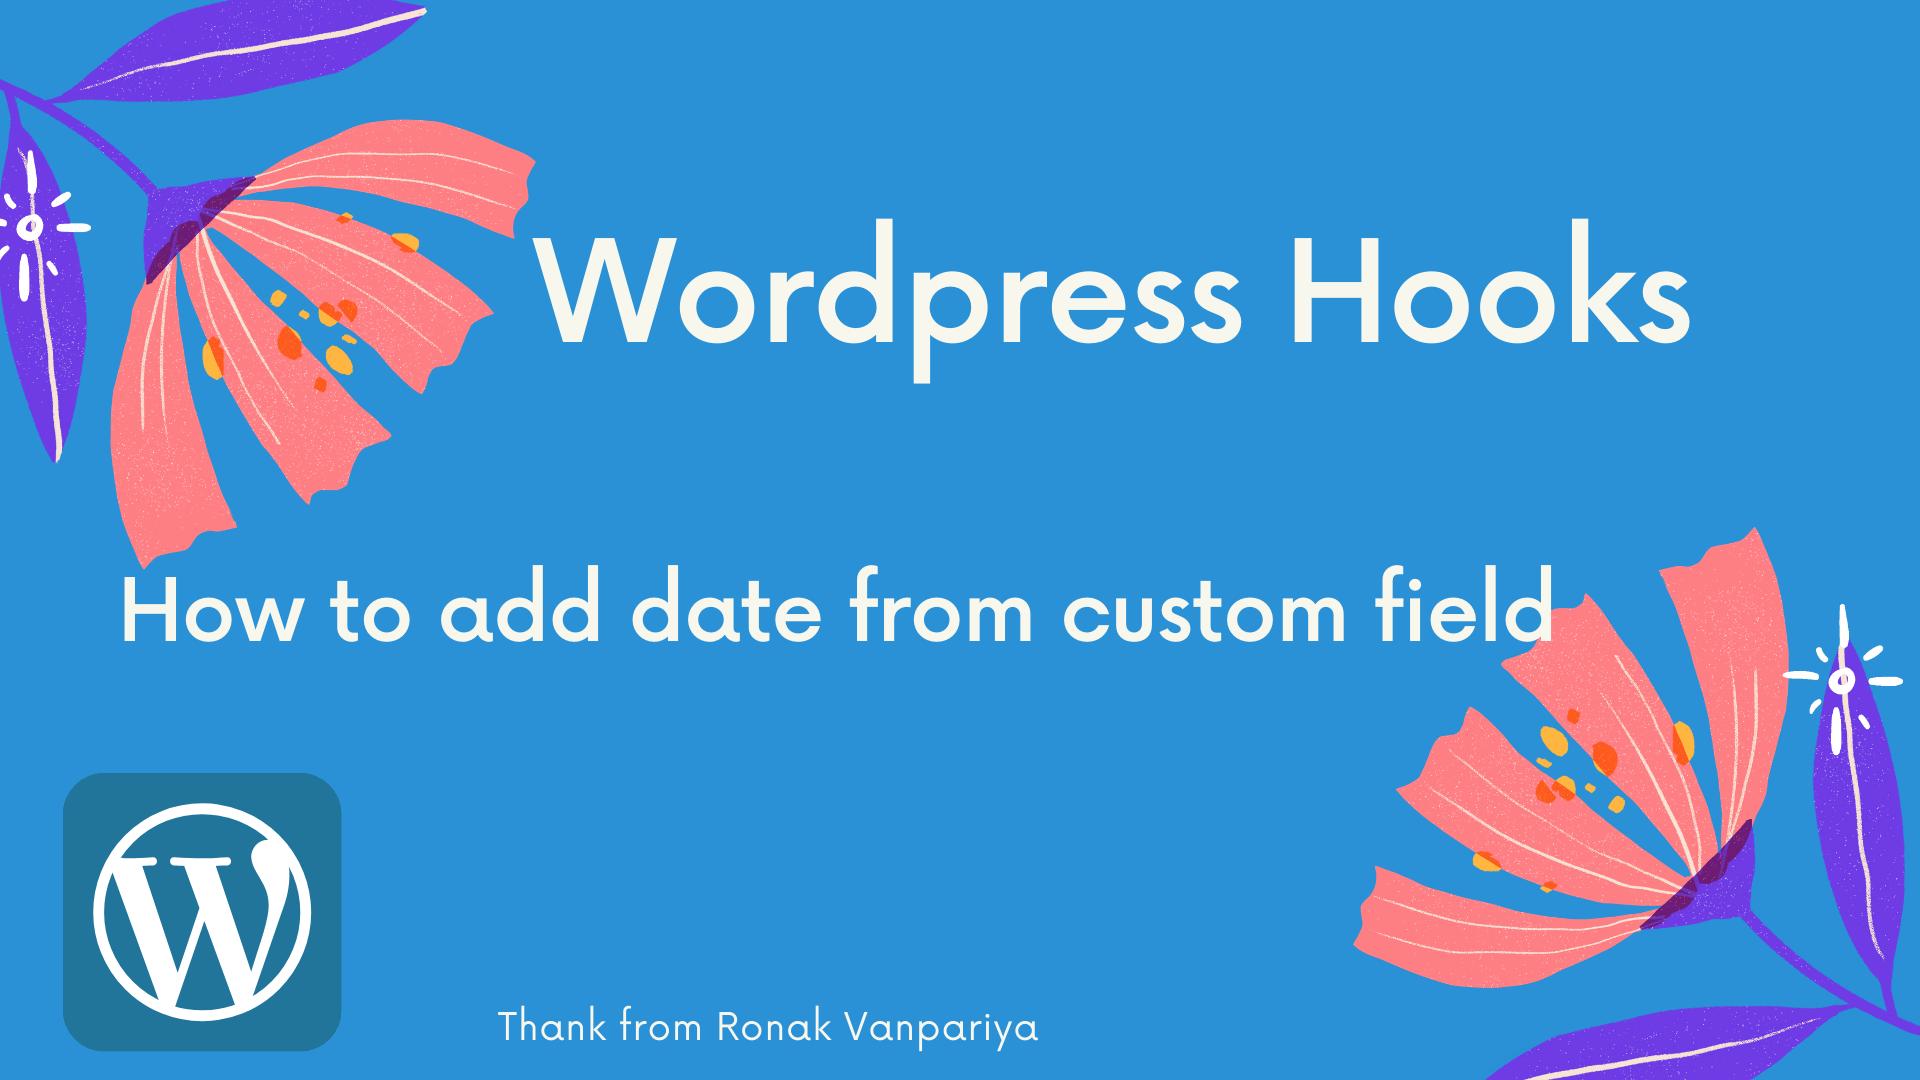 How to Change the Date From Custom Custom Field in Wordpress